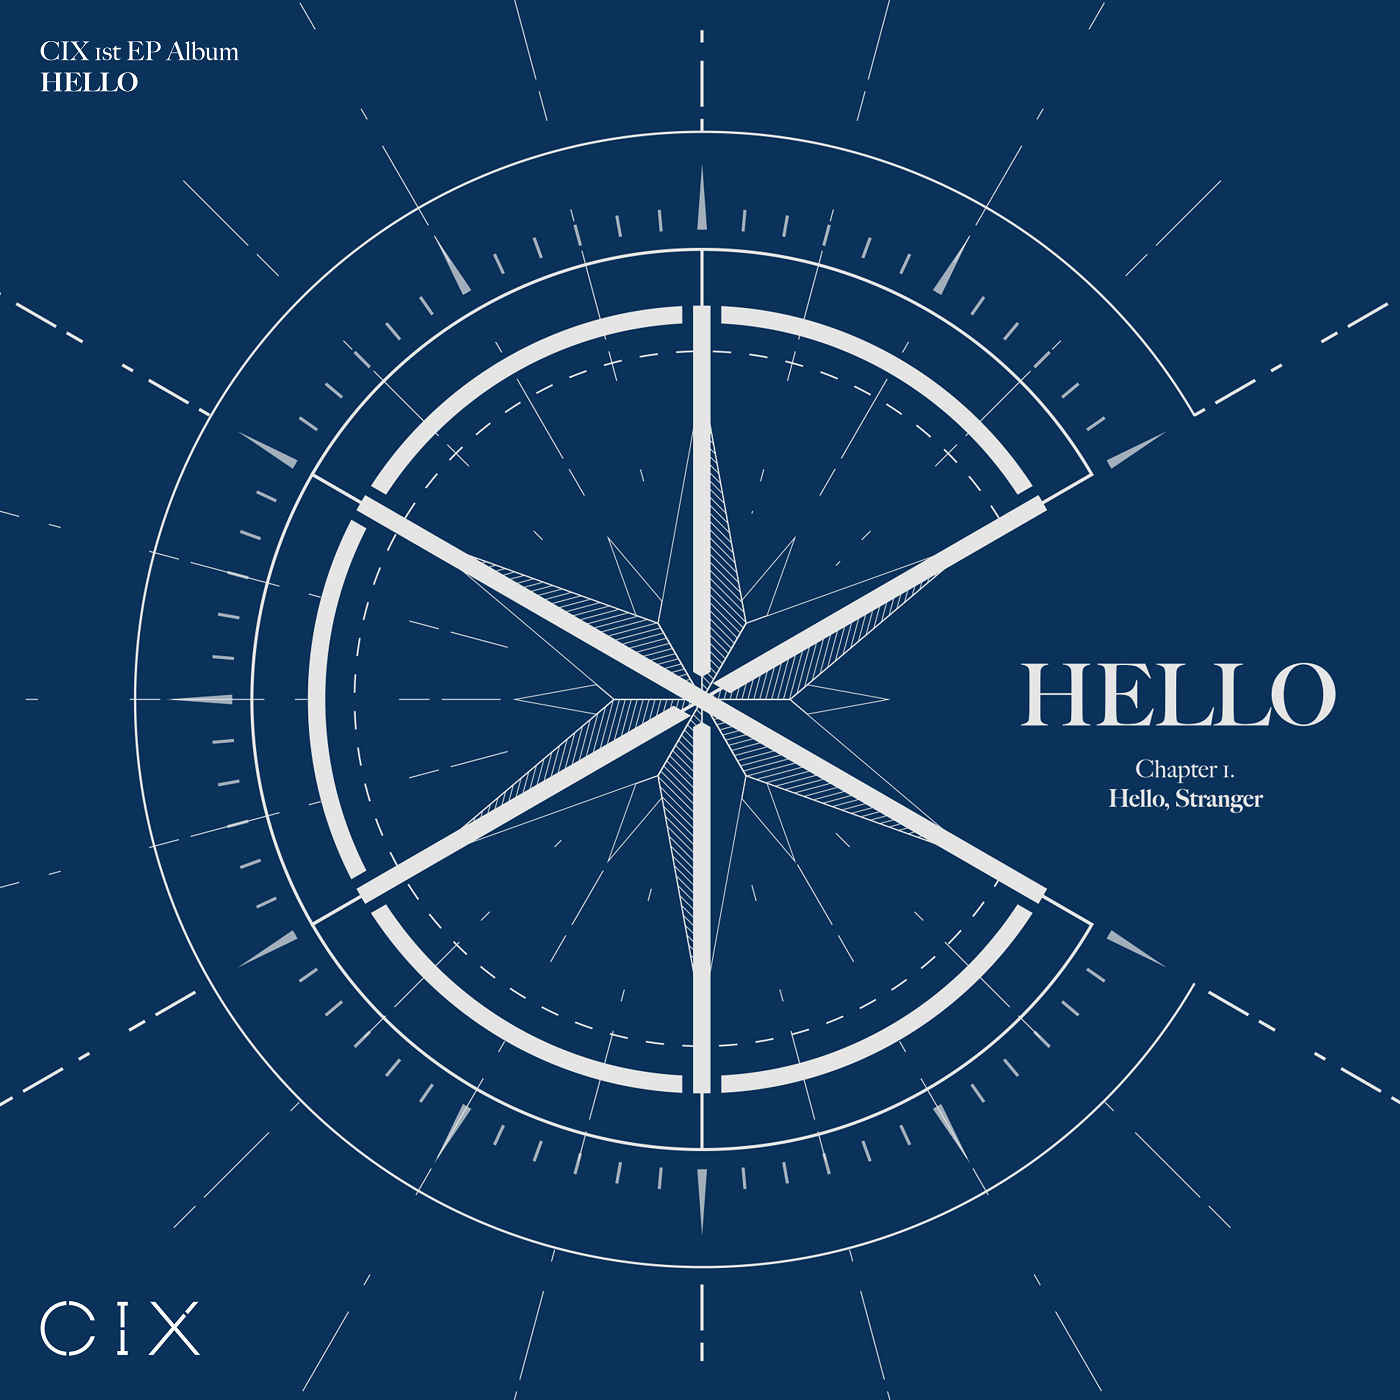 Hello Chapter 1. Hello, Stranger